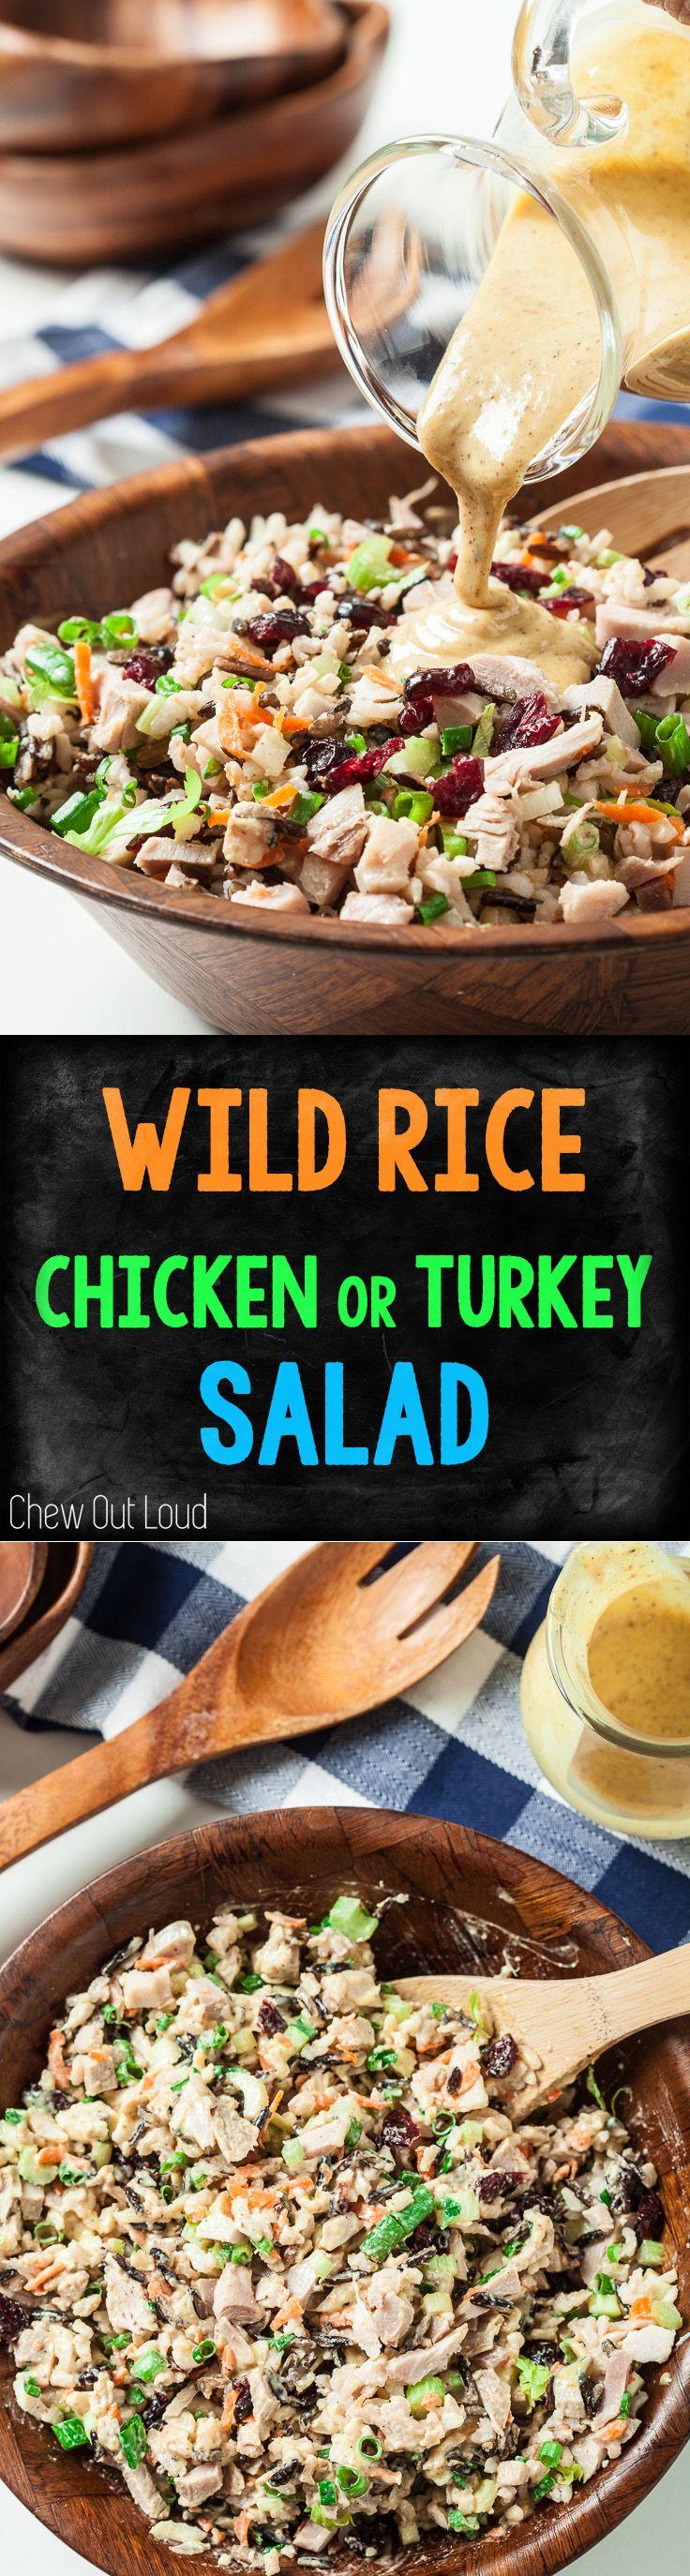 Skyroom's Wild Rice Chicken/Turkey Salad. Healthy, hearty, delish! #glutenfree #chicken #turkey #salad